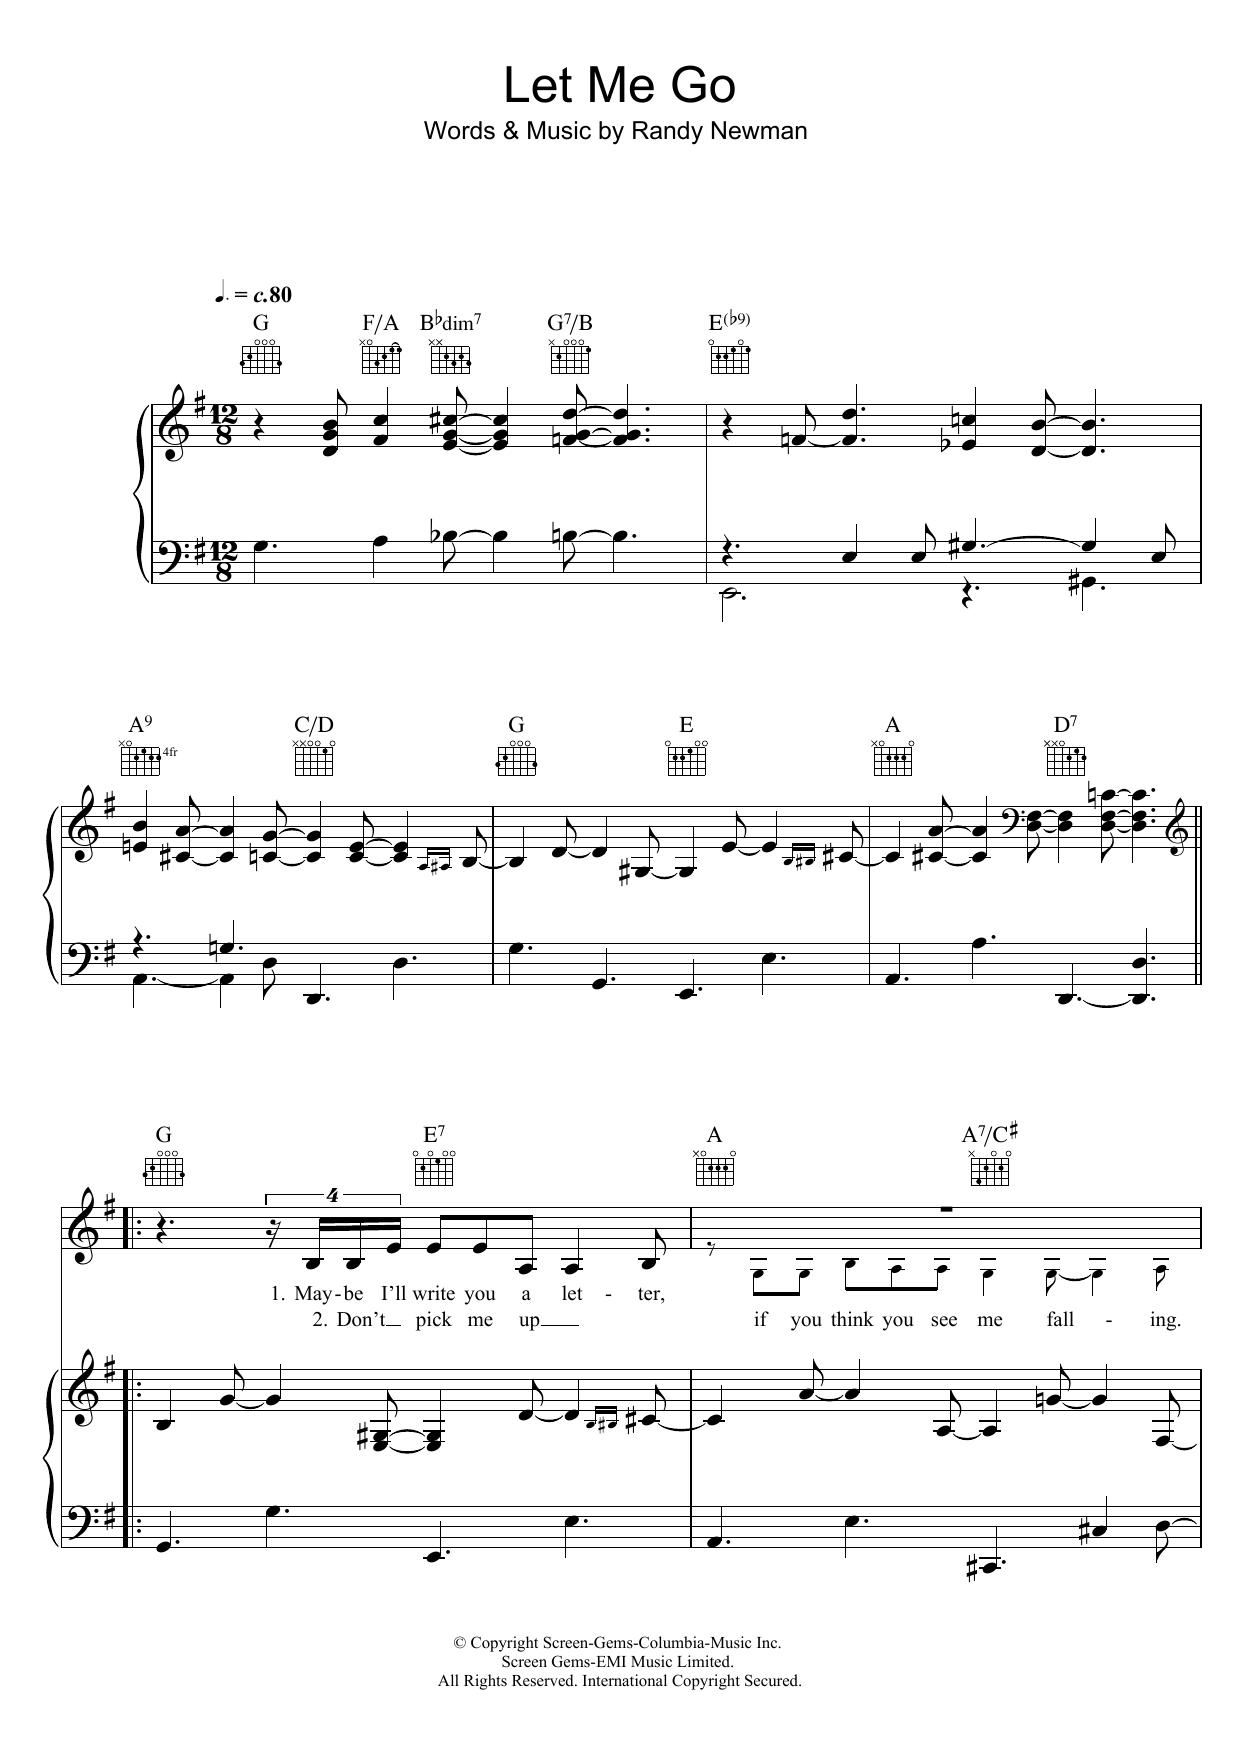 Let Me Go Sheet Music